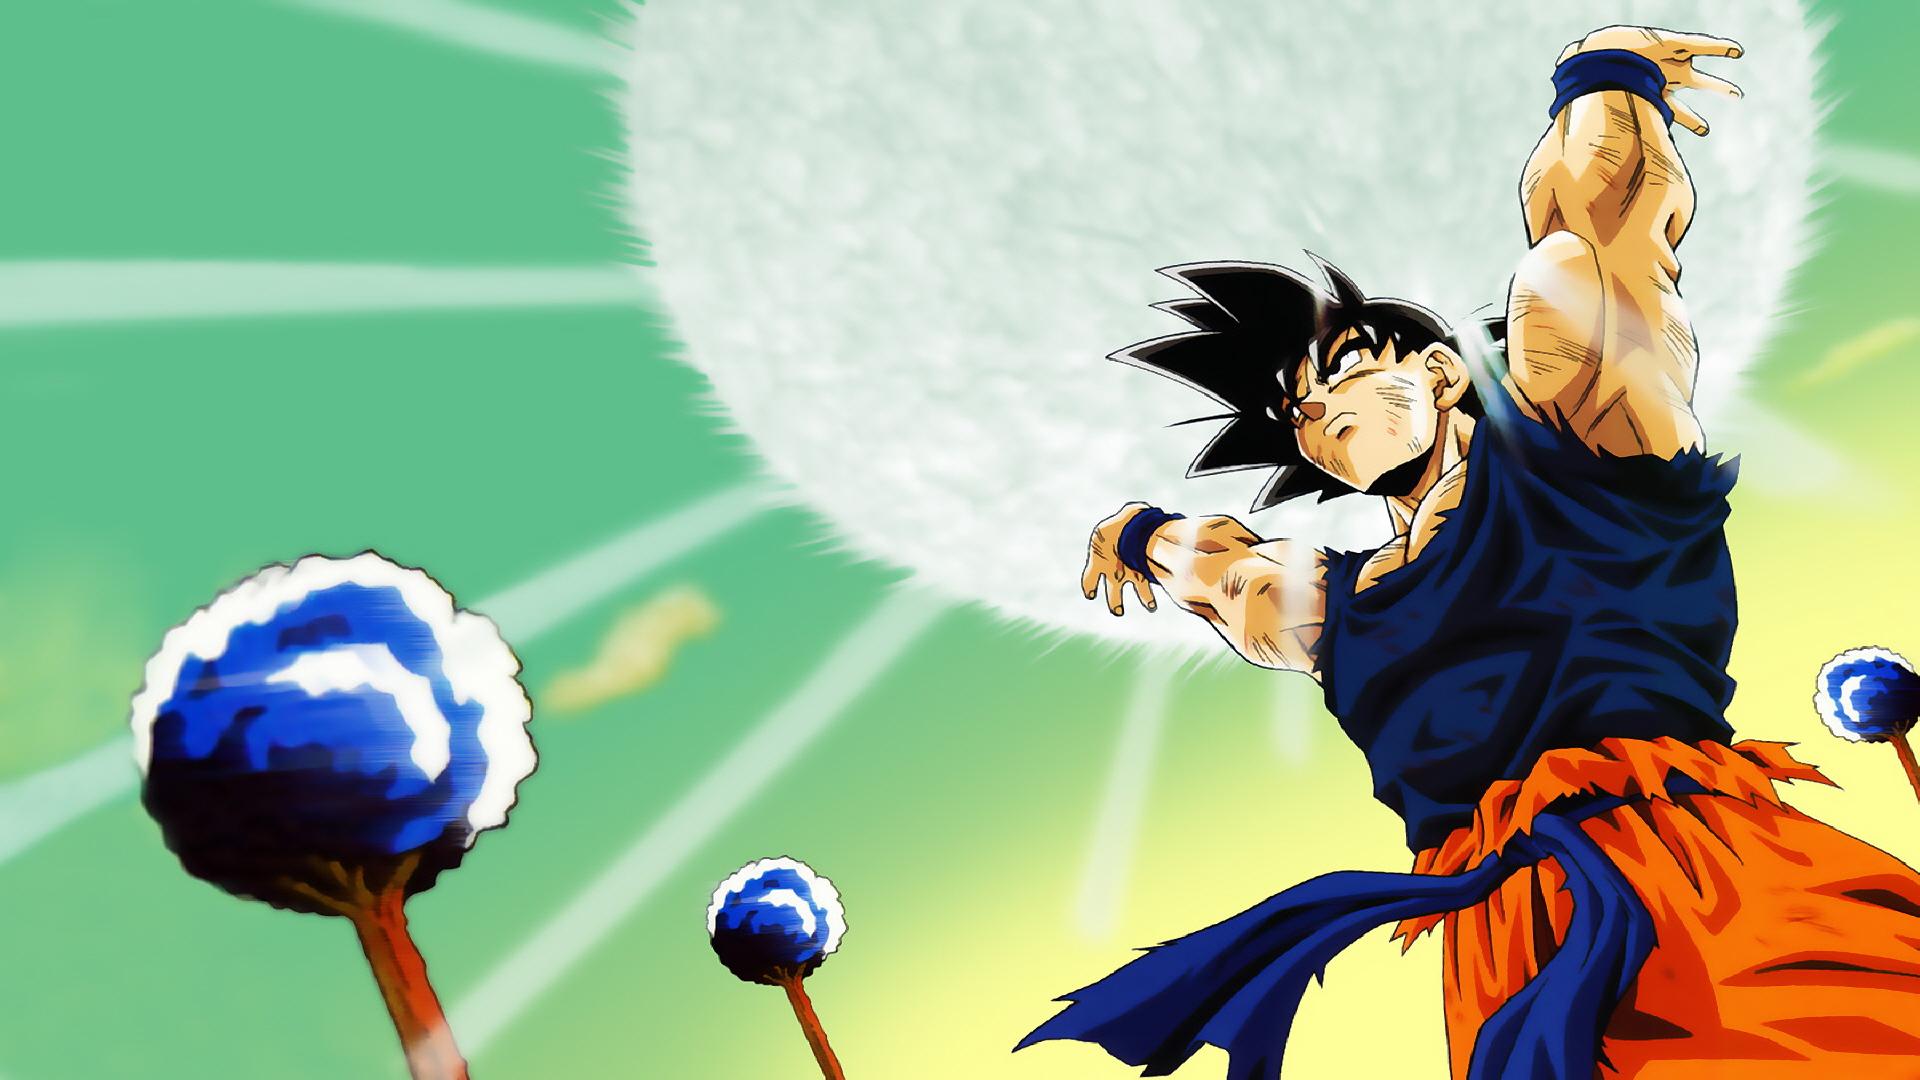 Goku S Spirit Bomb Full Hd Wallpaper And Background